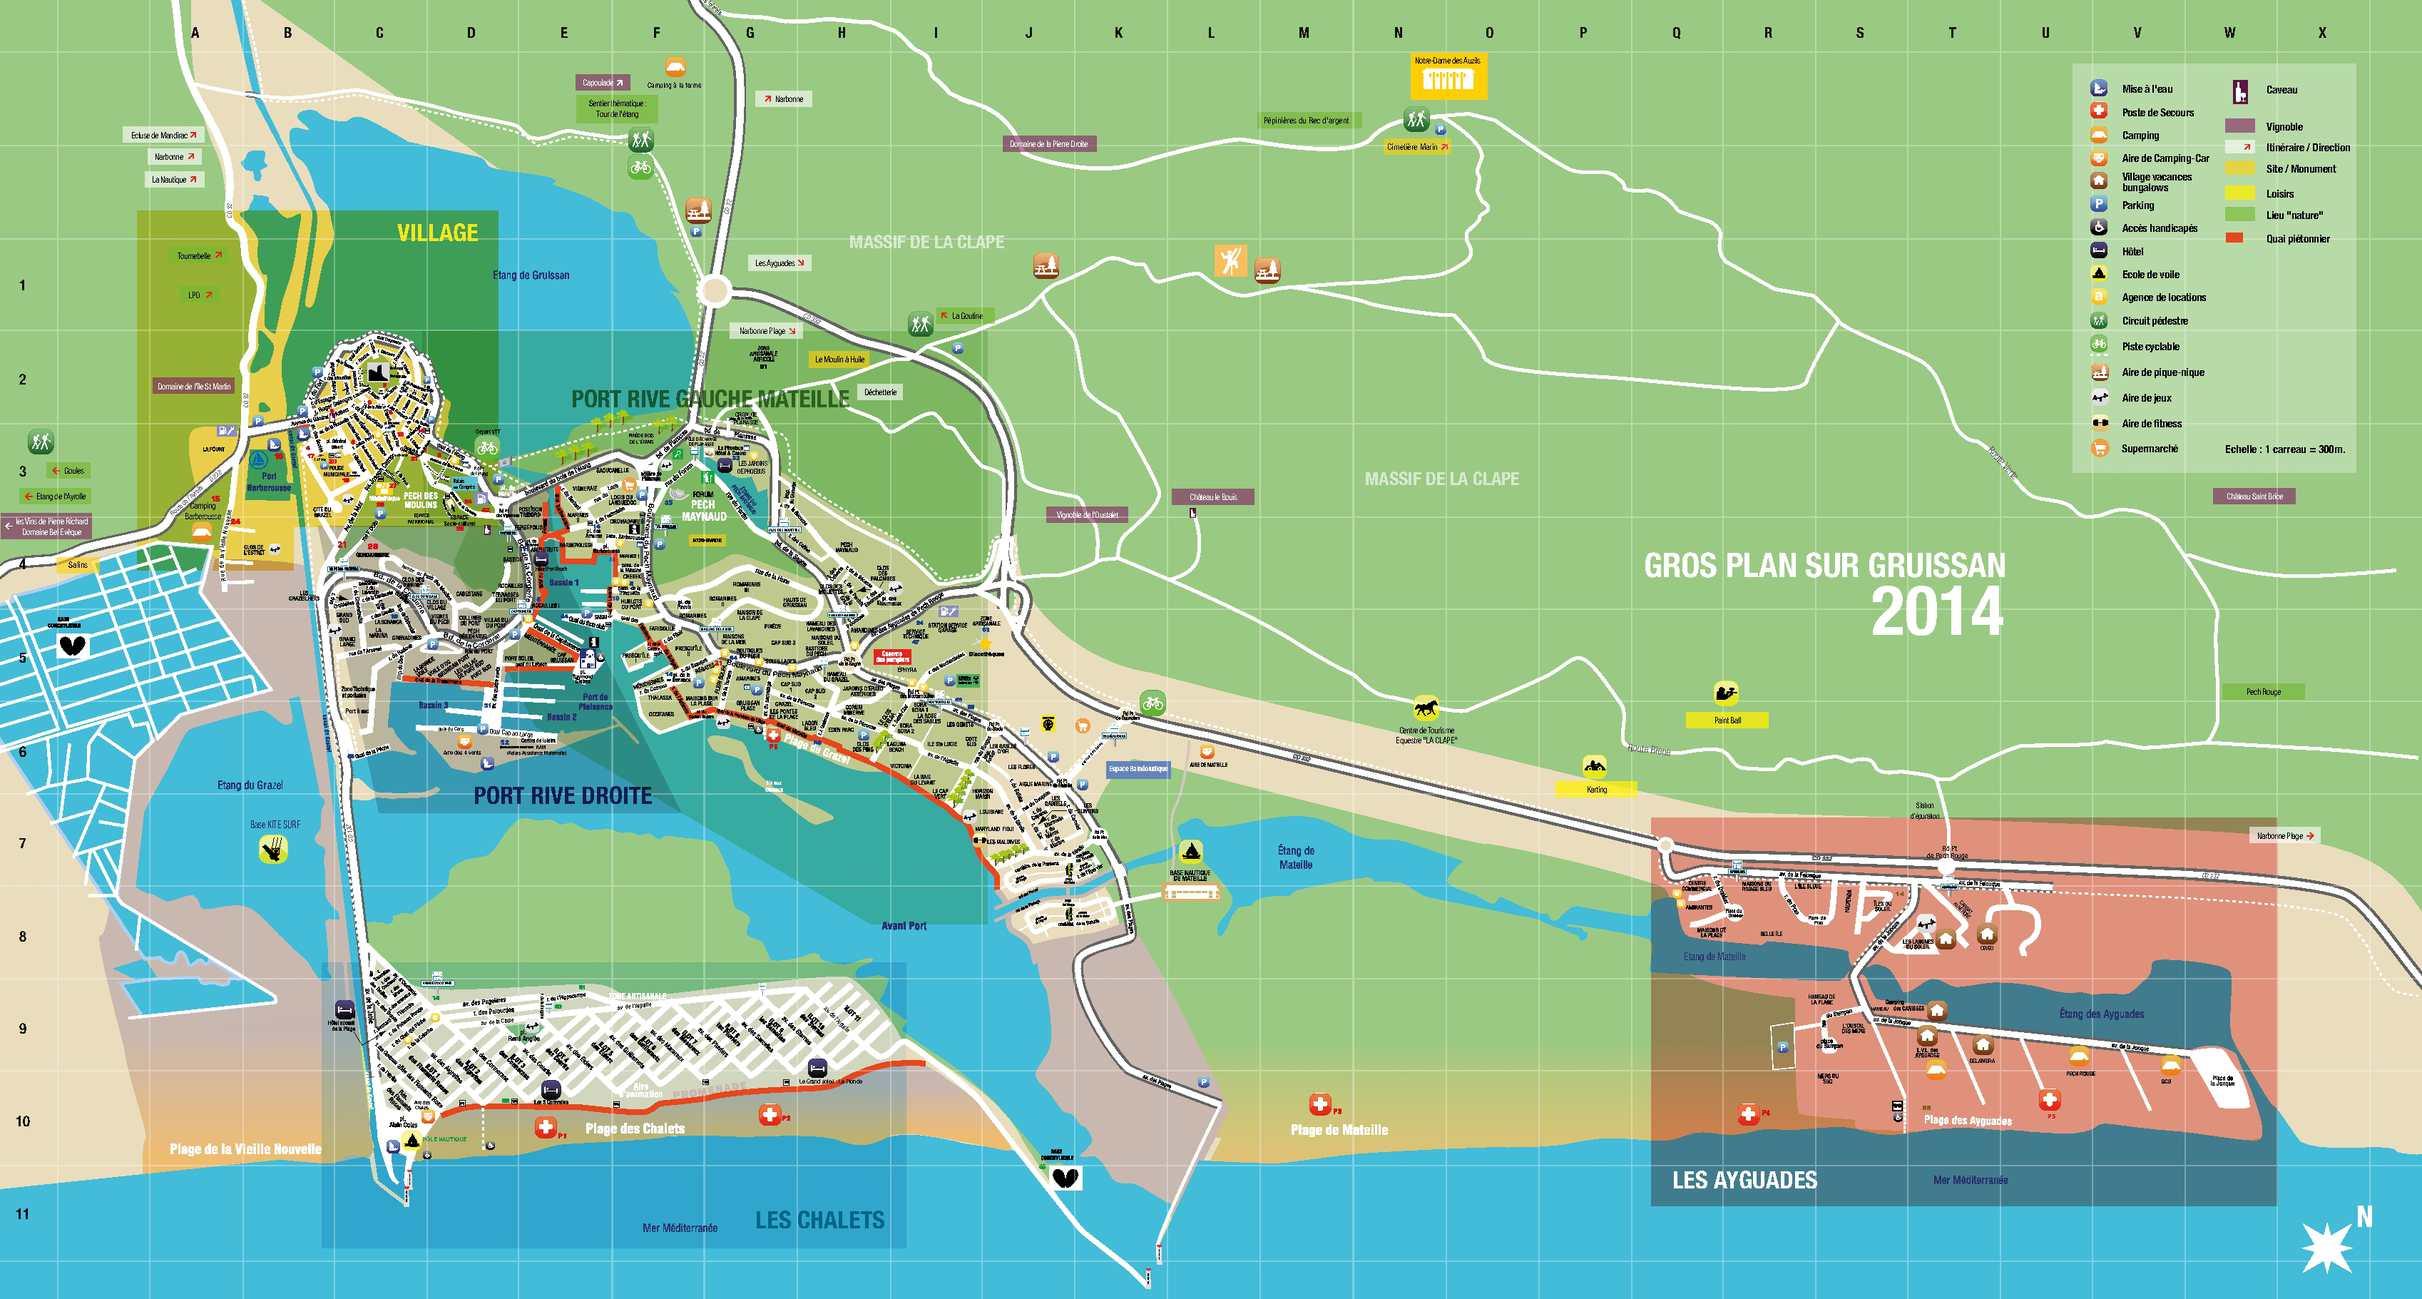 Calam o plan du village de gruissan - Office du tourisme de gruissan ...